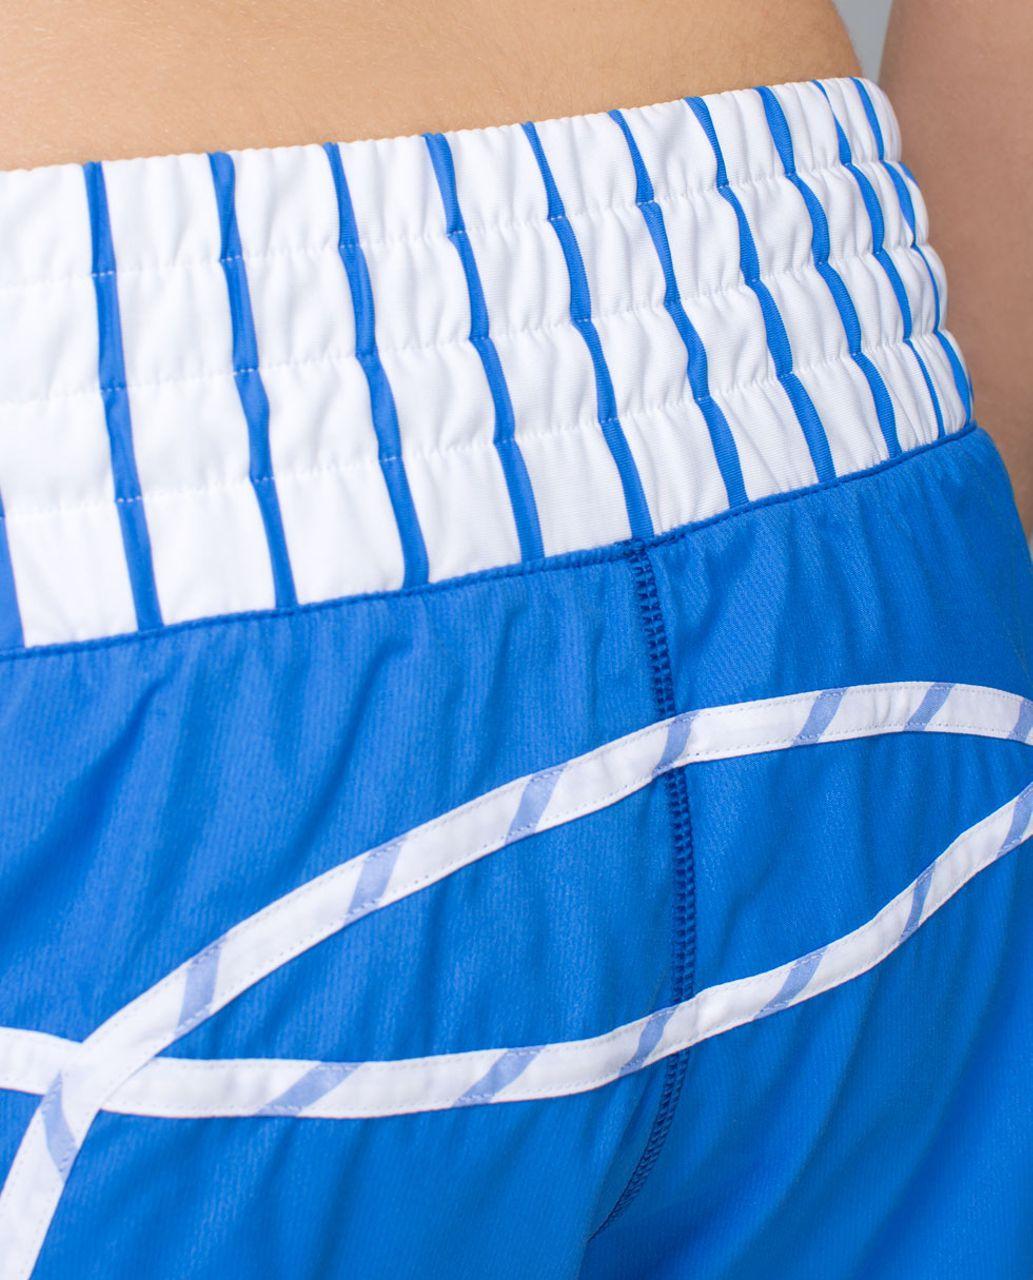 Lululemon Tracker Short II *2-way Stretch - Pipe Dream Blue / Deauville Stripe Pipe Dream Blue White